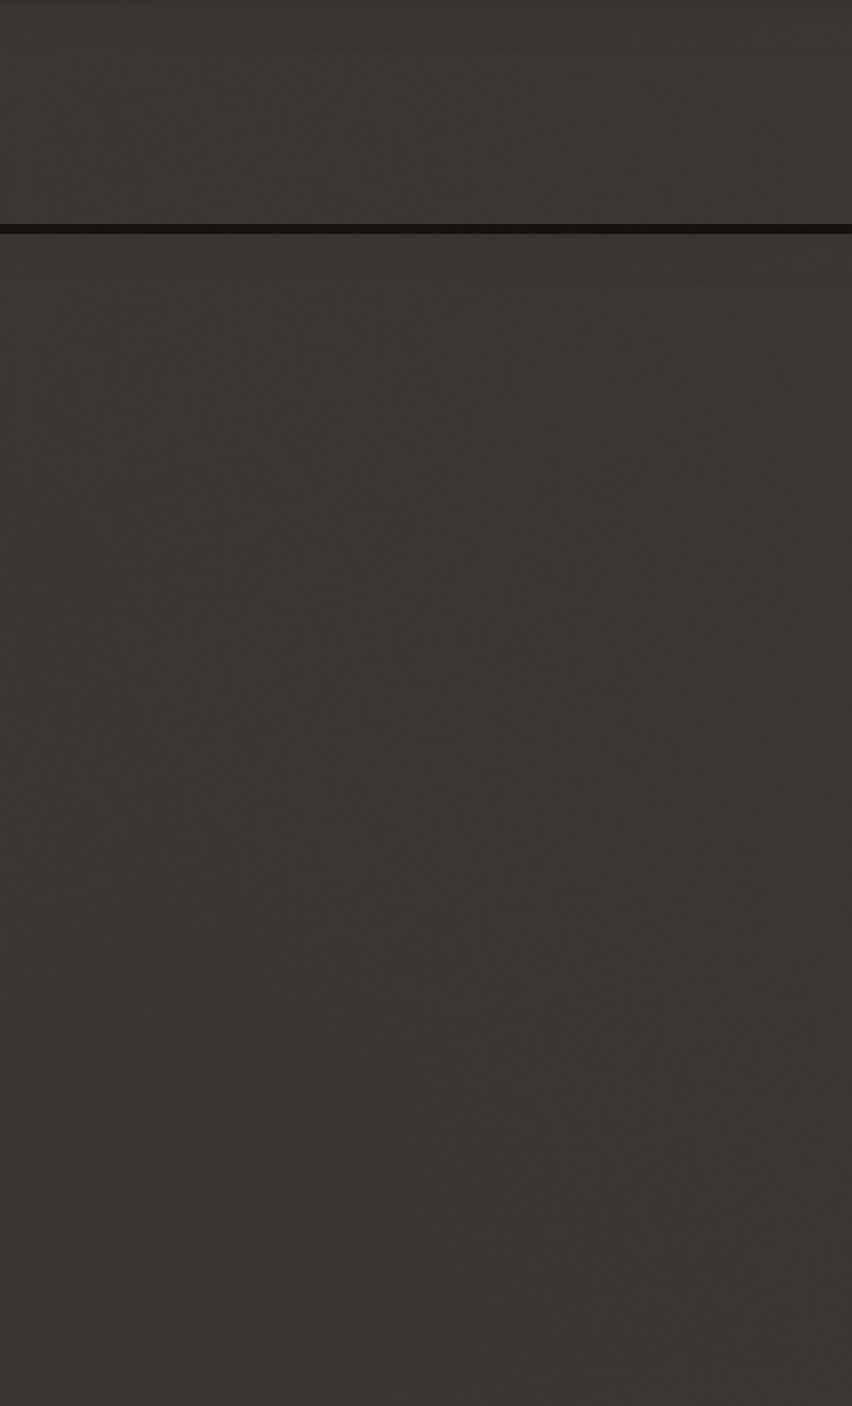 remo graphite_door.5a9c21e70a431a1bca163450972372f6.jpg